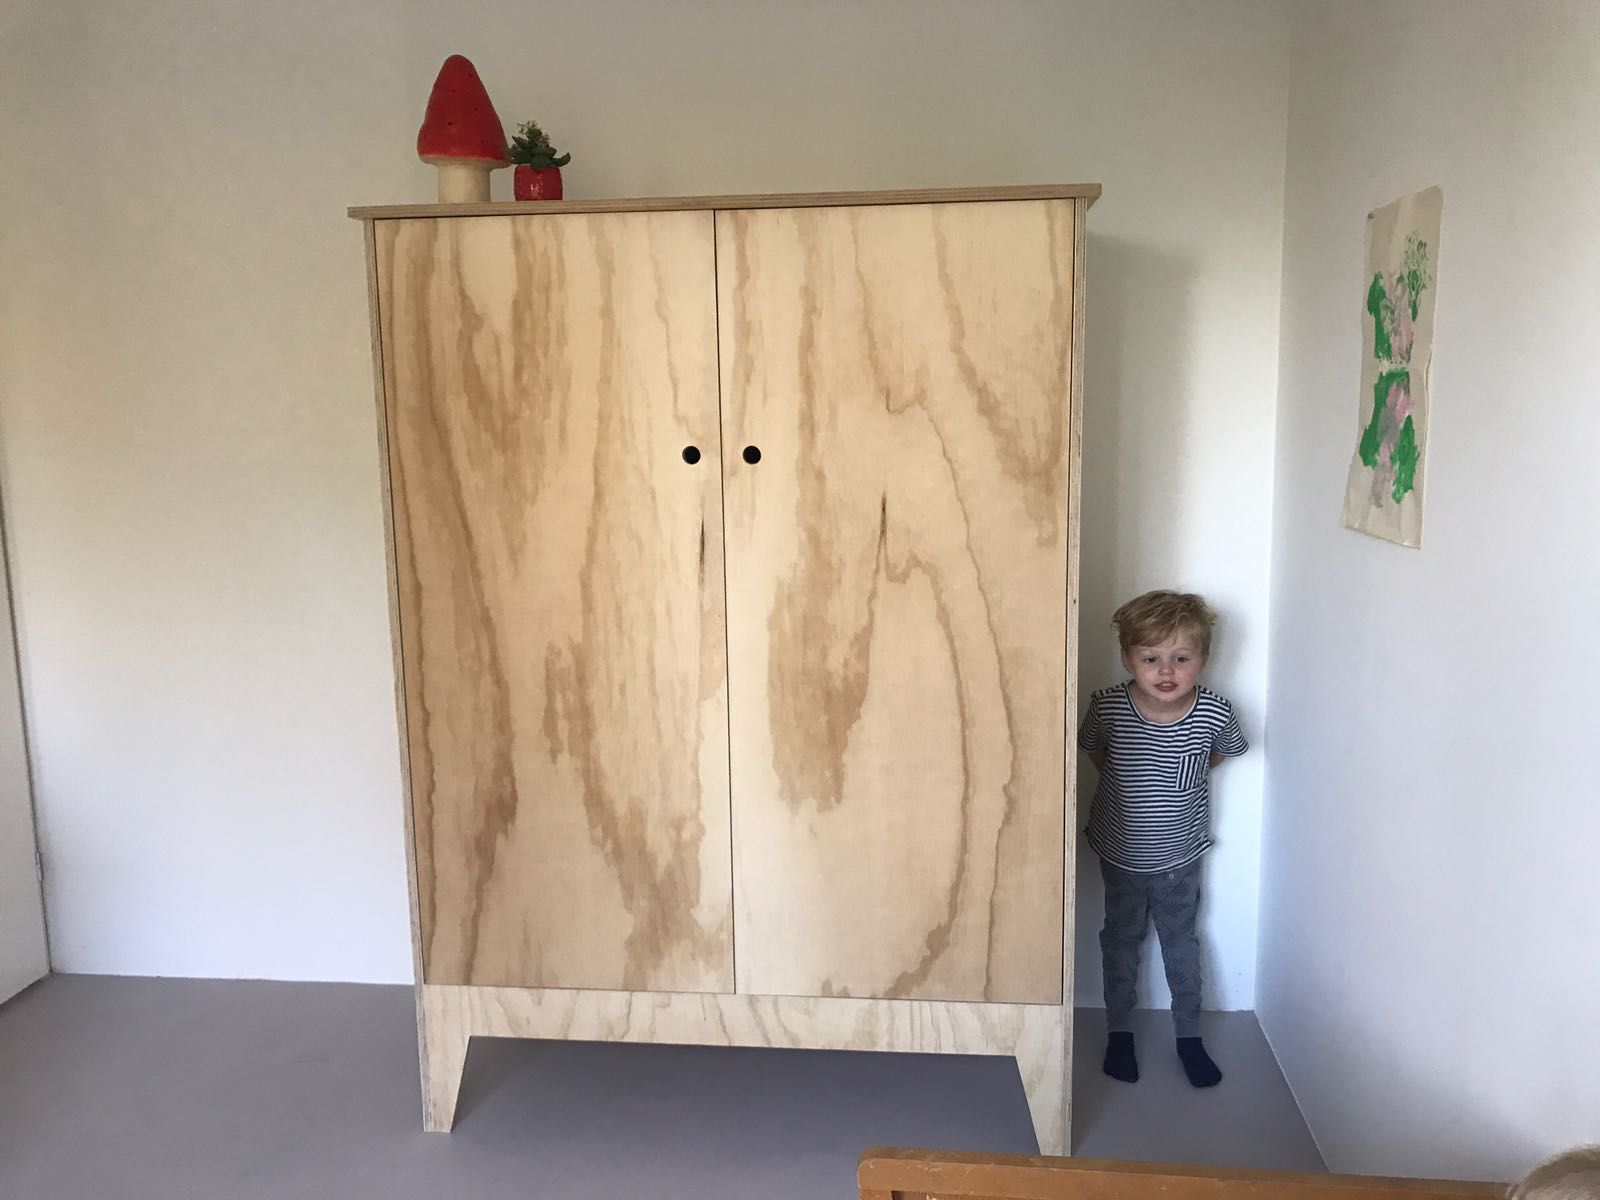 early dew flexa kast : Kinderkledingkast Van Multiplex Kledingkast Kinderkamer